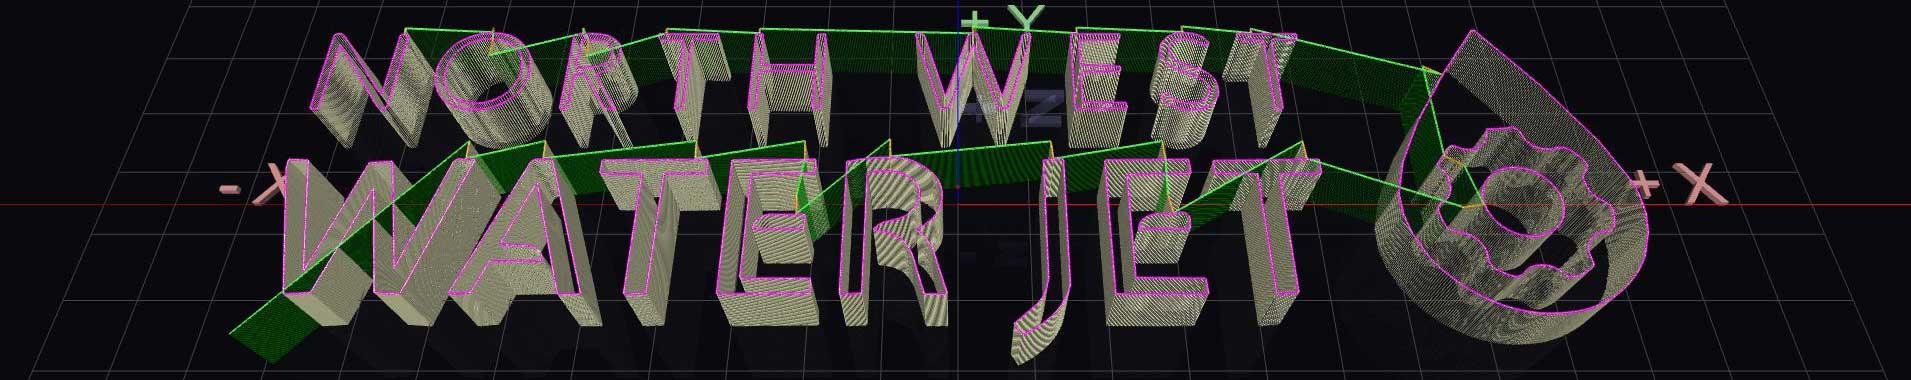 3D CAD image of waterjet profiling